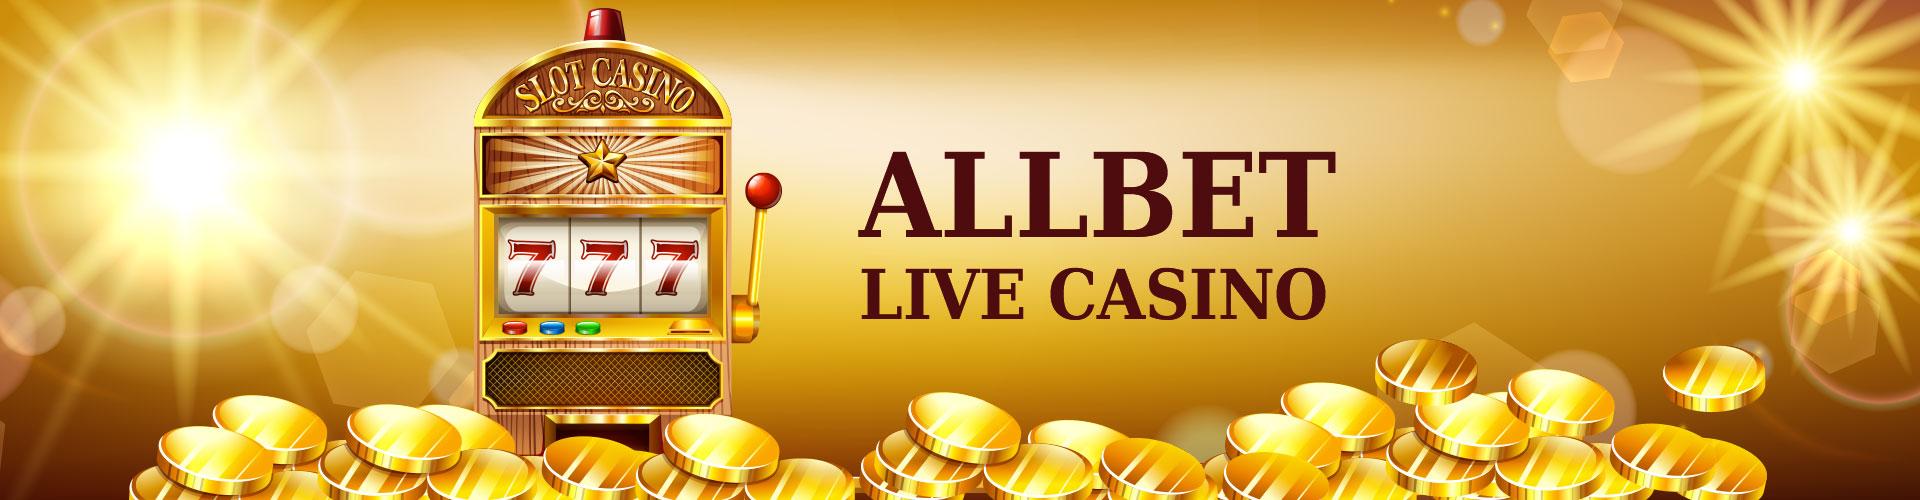 hit it rich casino slots facebook